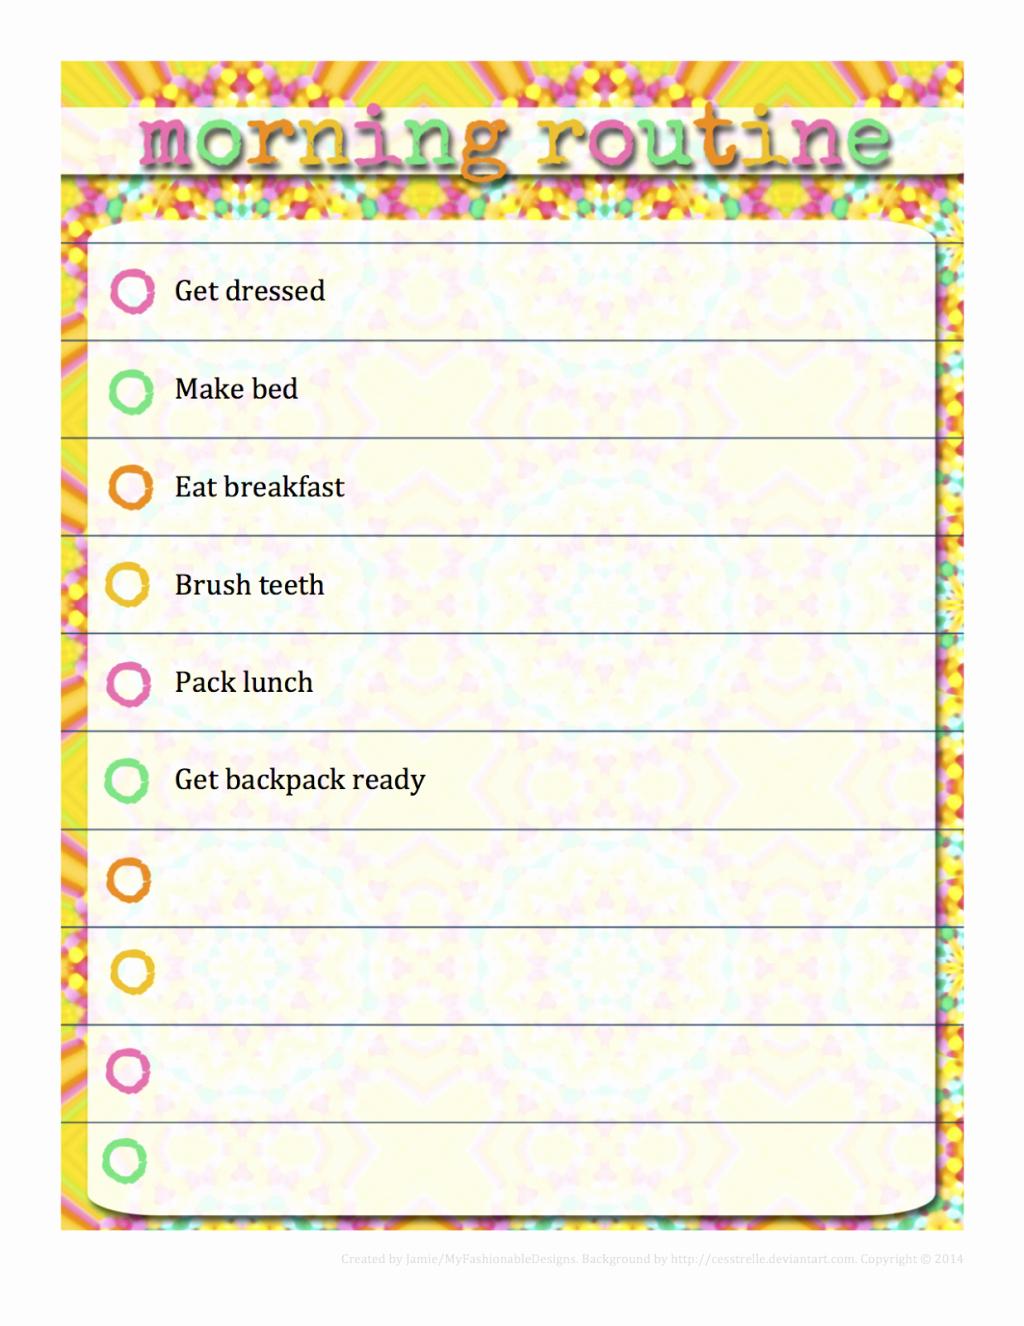 Morning Routine Checklist Template Unique Morning Checklist Template Samples Our Three Peas for Kids